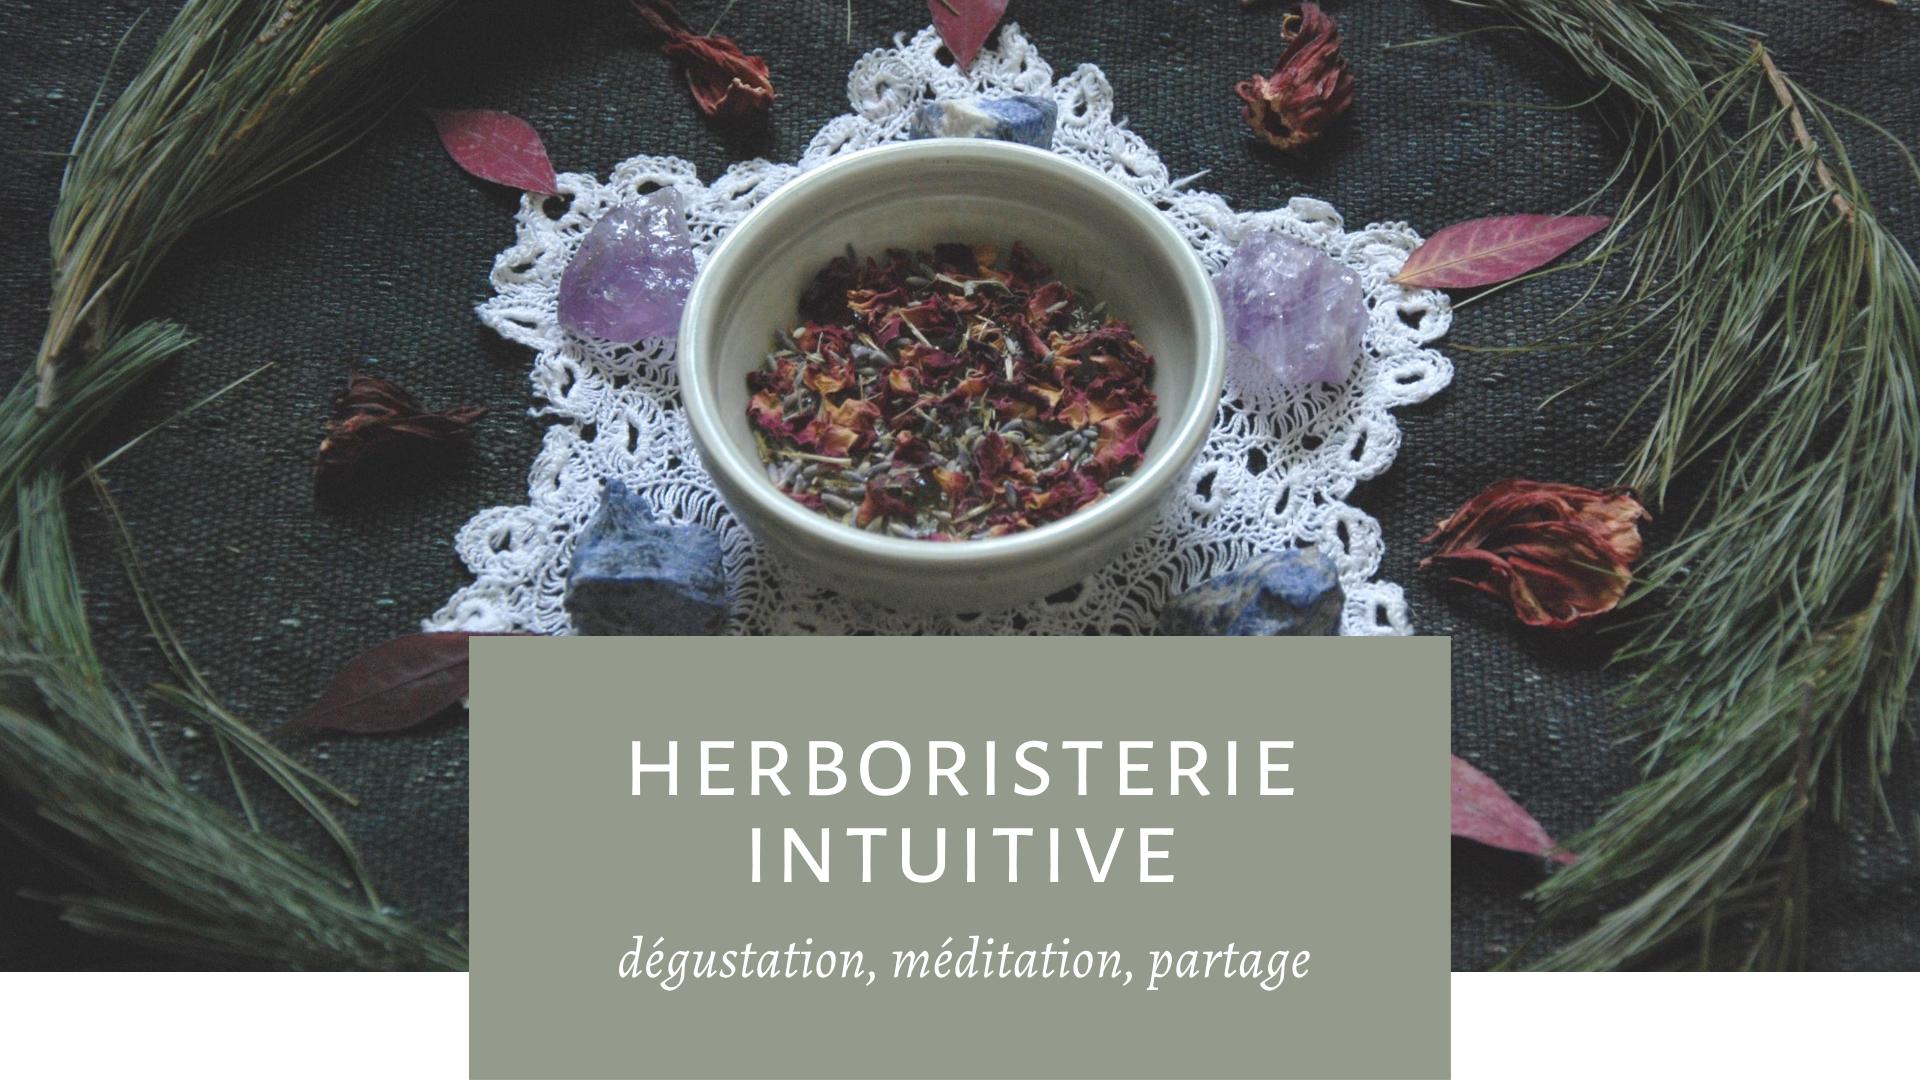 Herboristerie Intuitive: Dégustation, Méditation, Partage